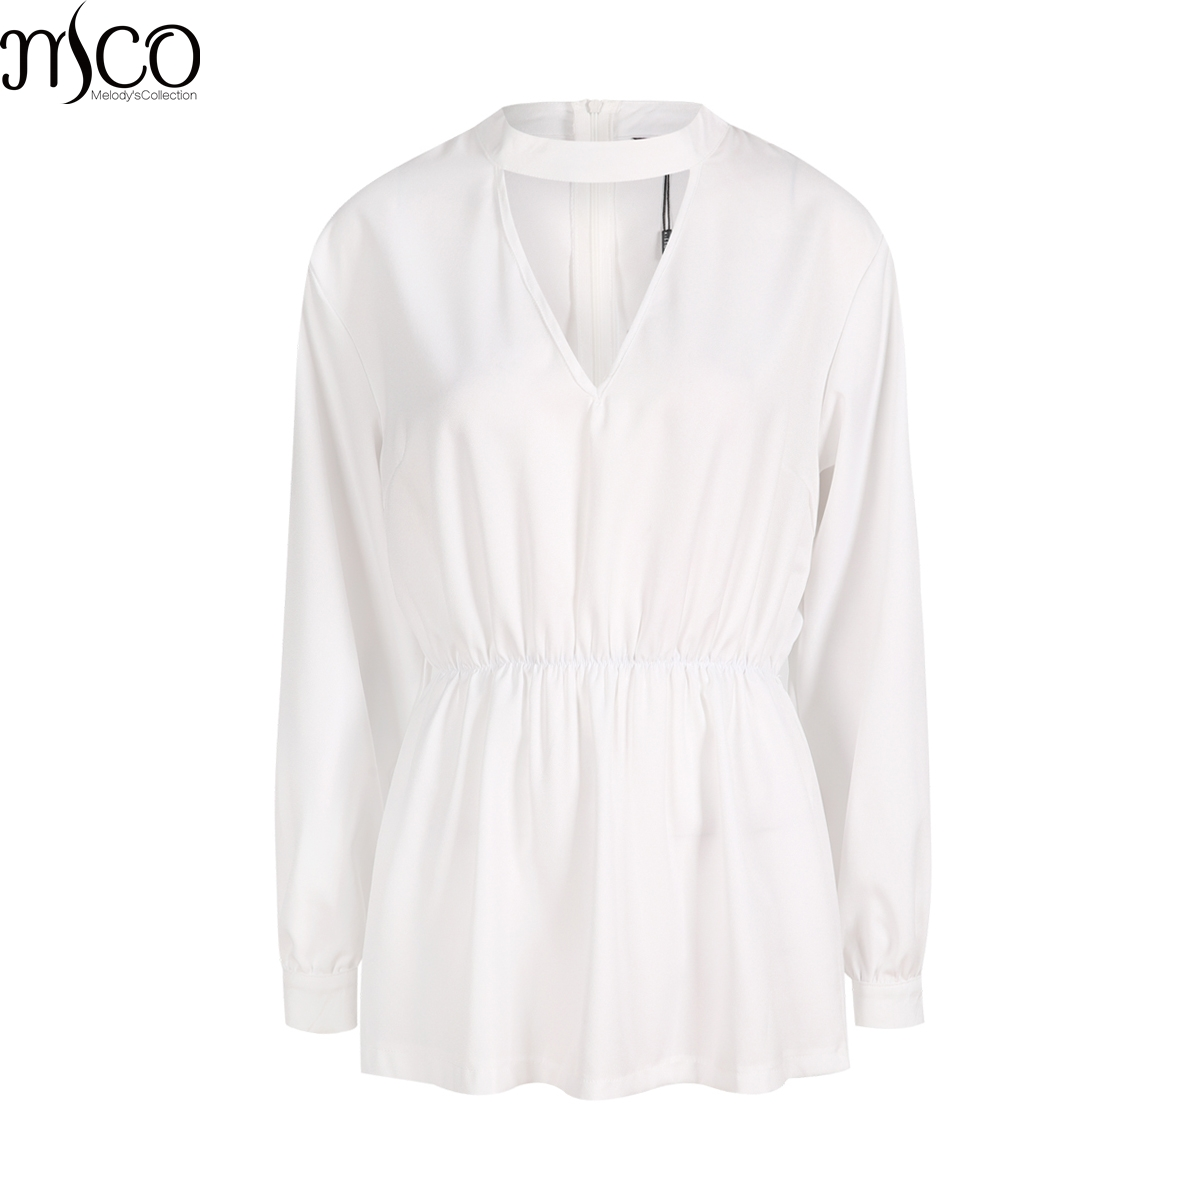 MCO Classic Chocker V Neck Plus Size Women Blouse Basic Office Ladies Big Shirt Oversized Simple OL Peplum Black Top 5xl 6xl 7xl